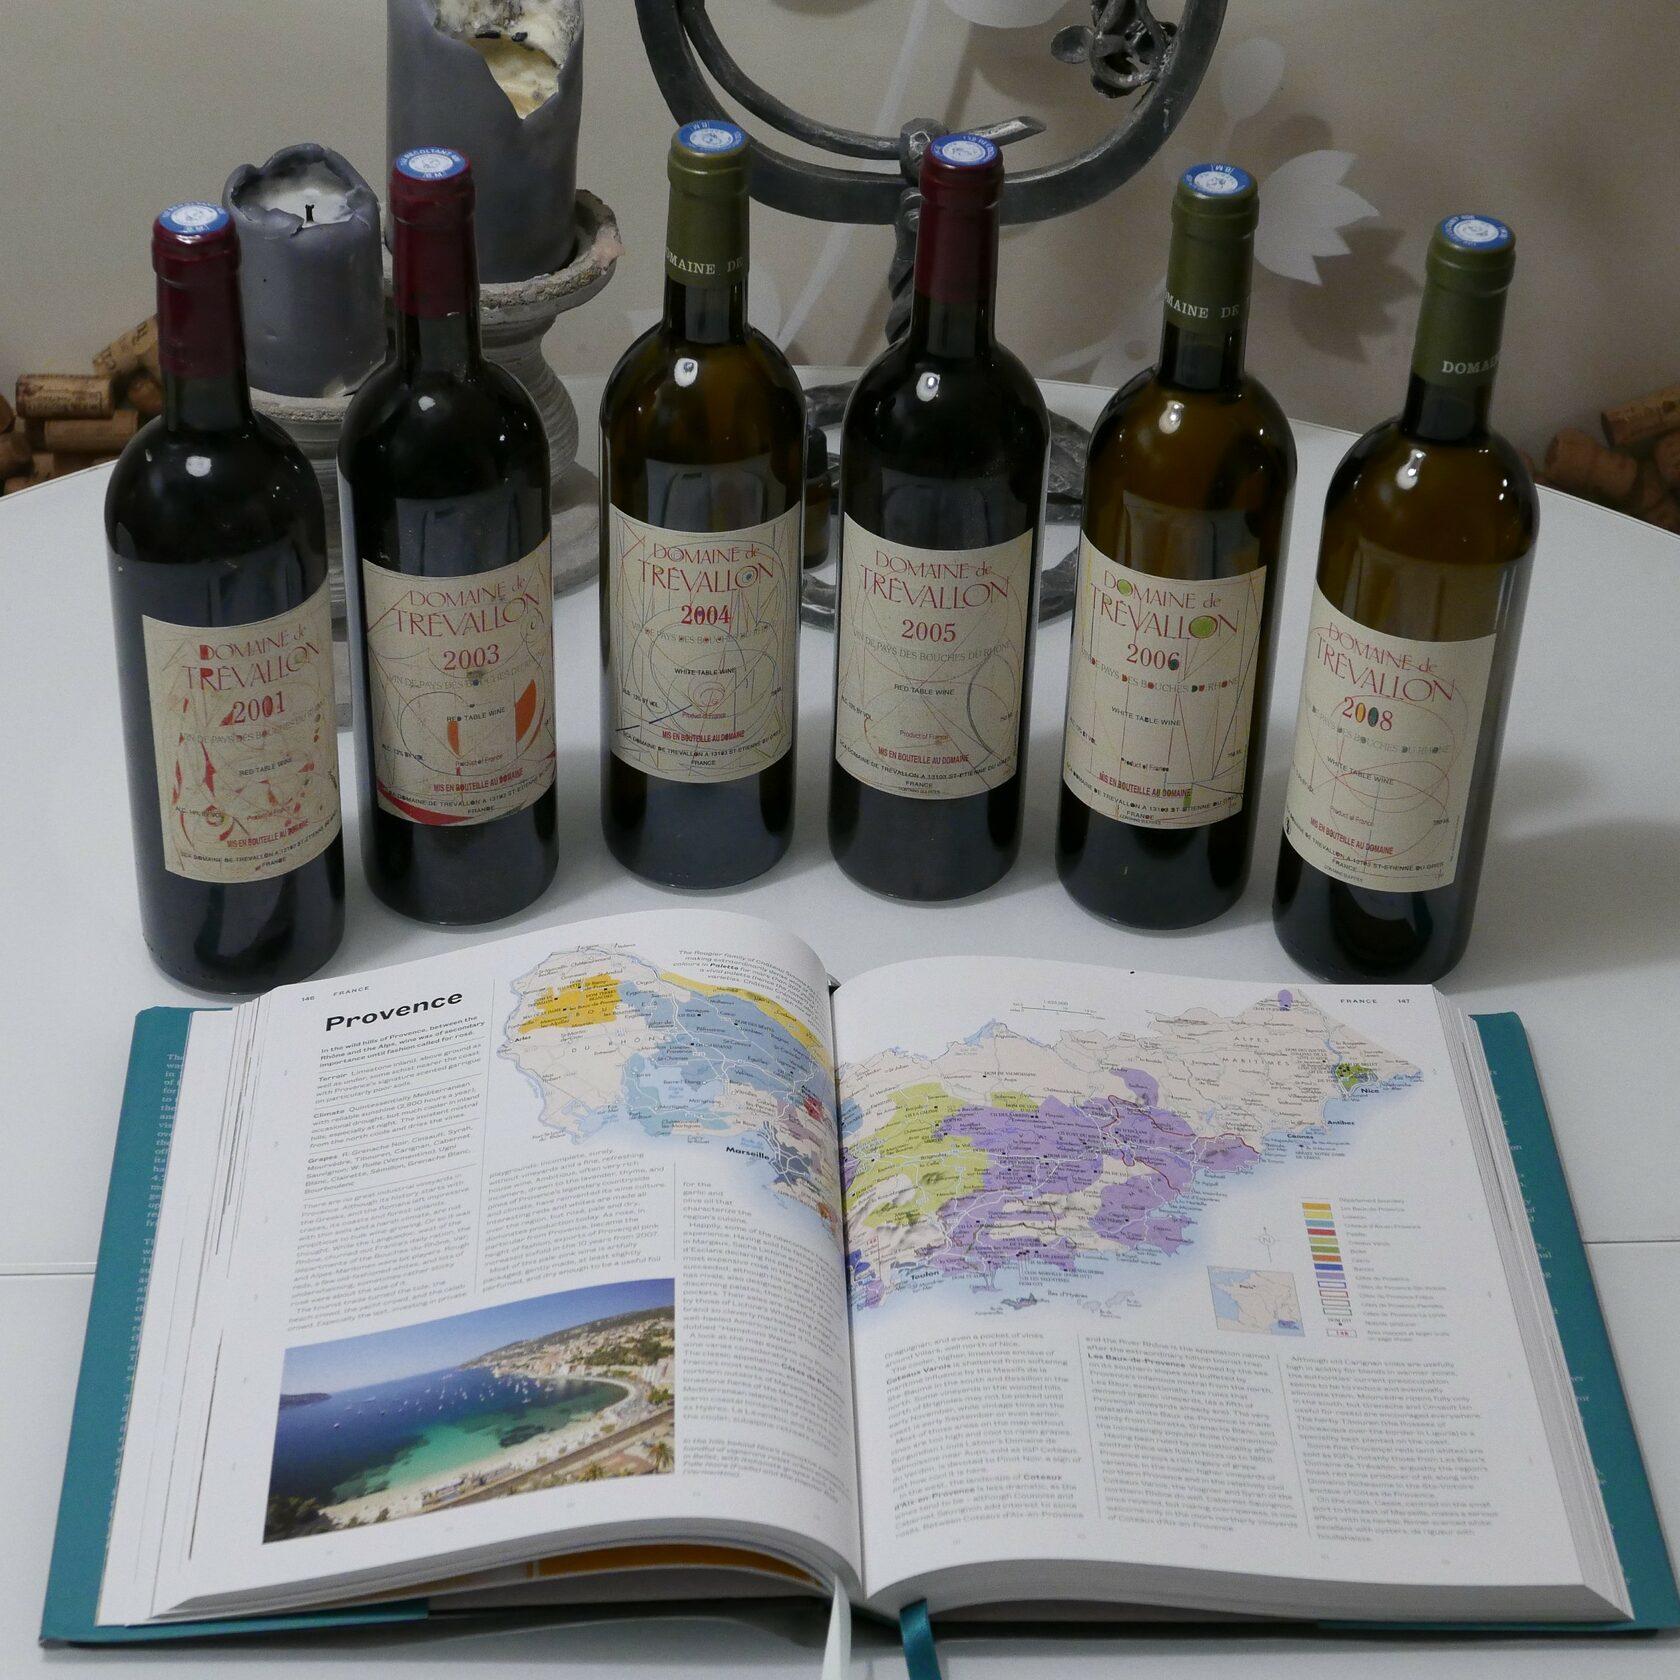 Domaine de Trévallon is arguably the finest producer in Provence region